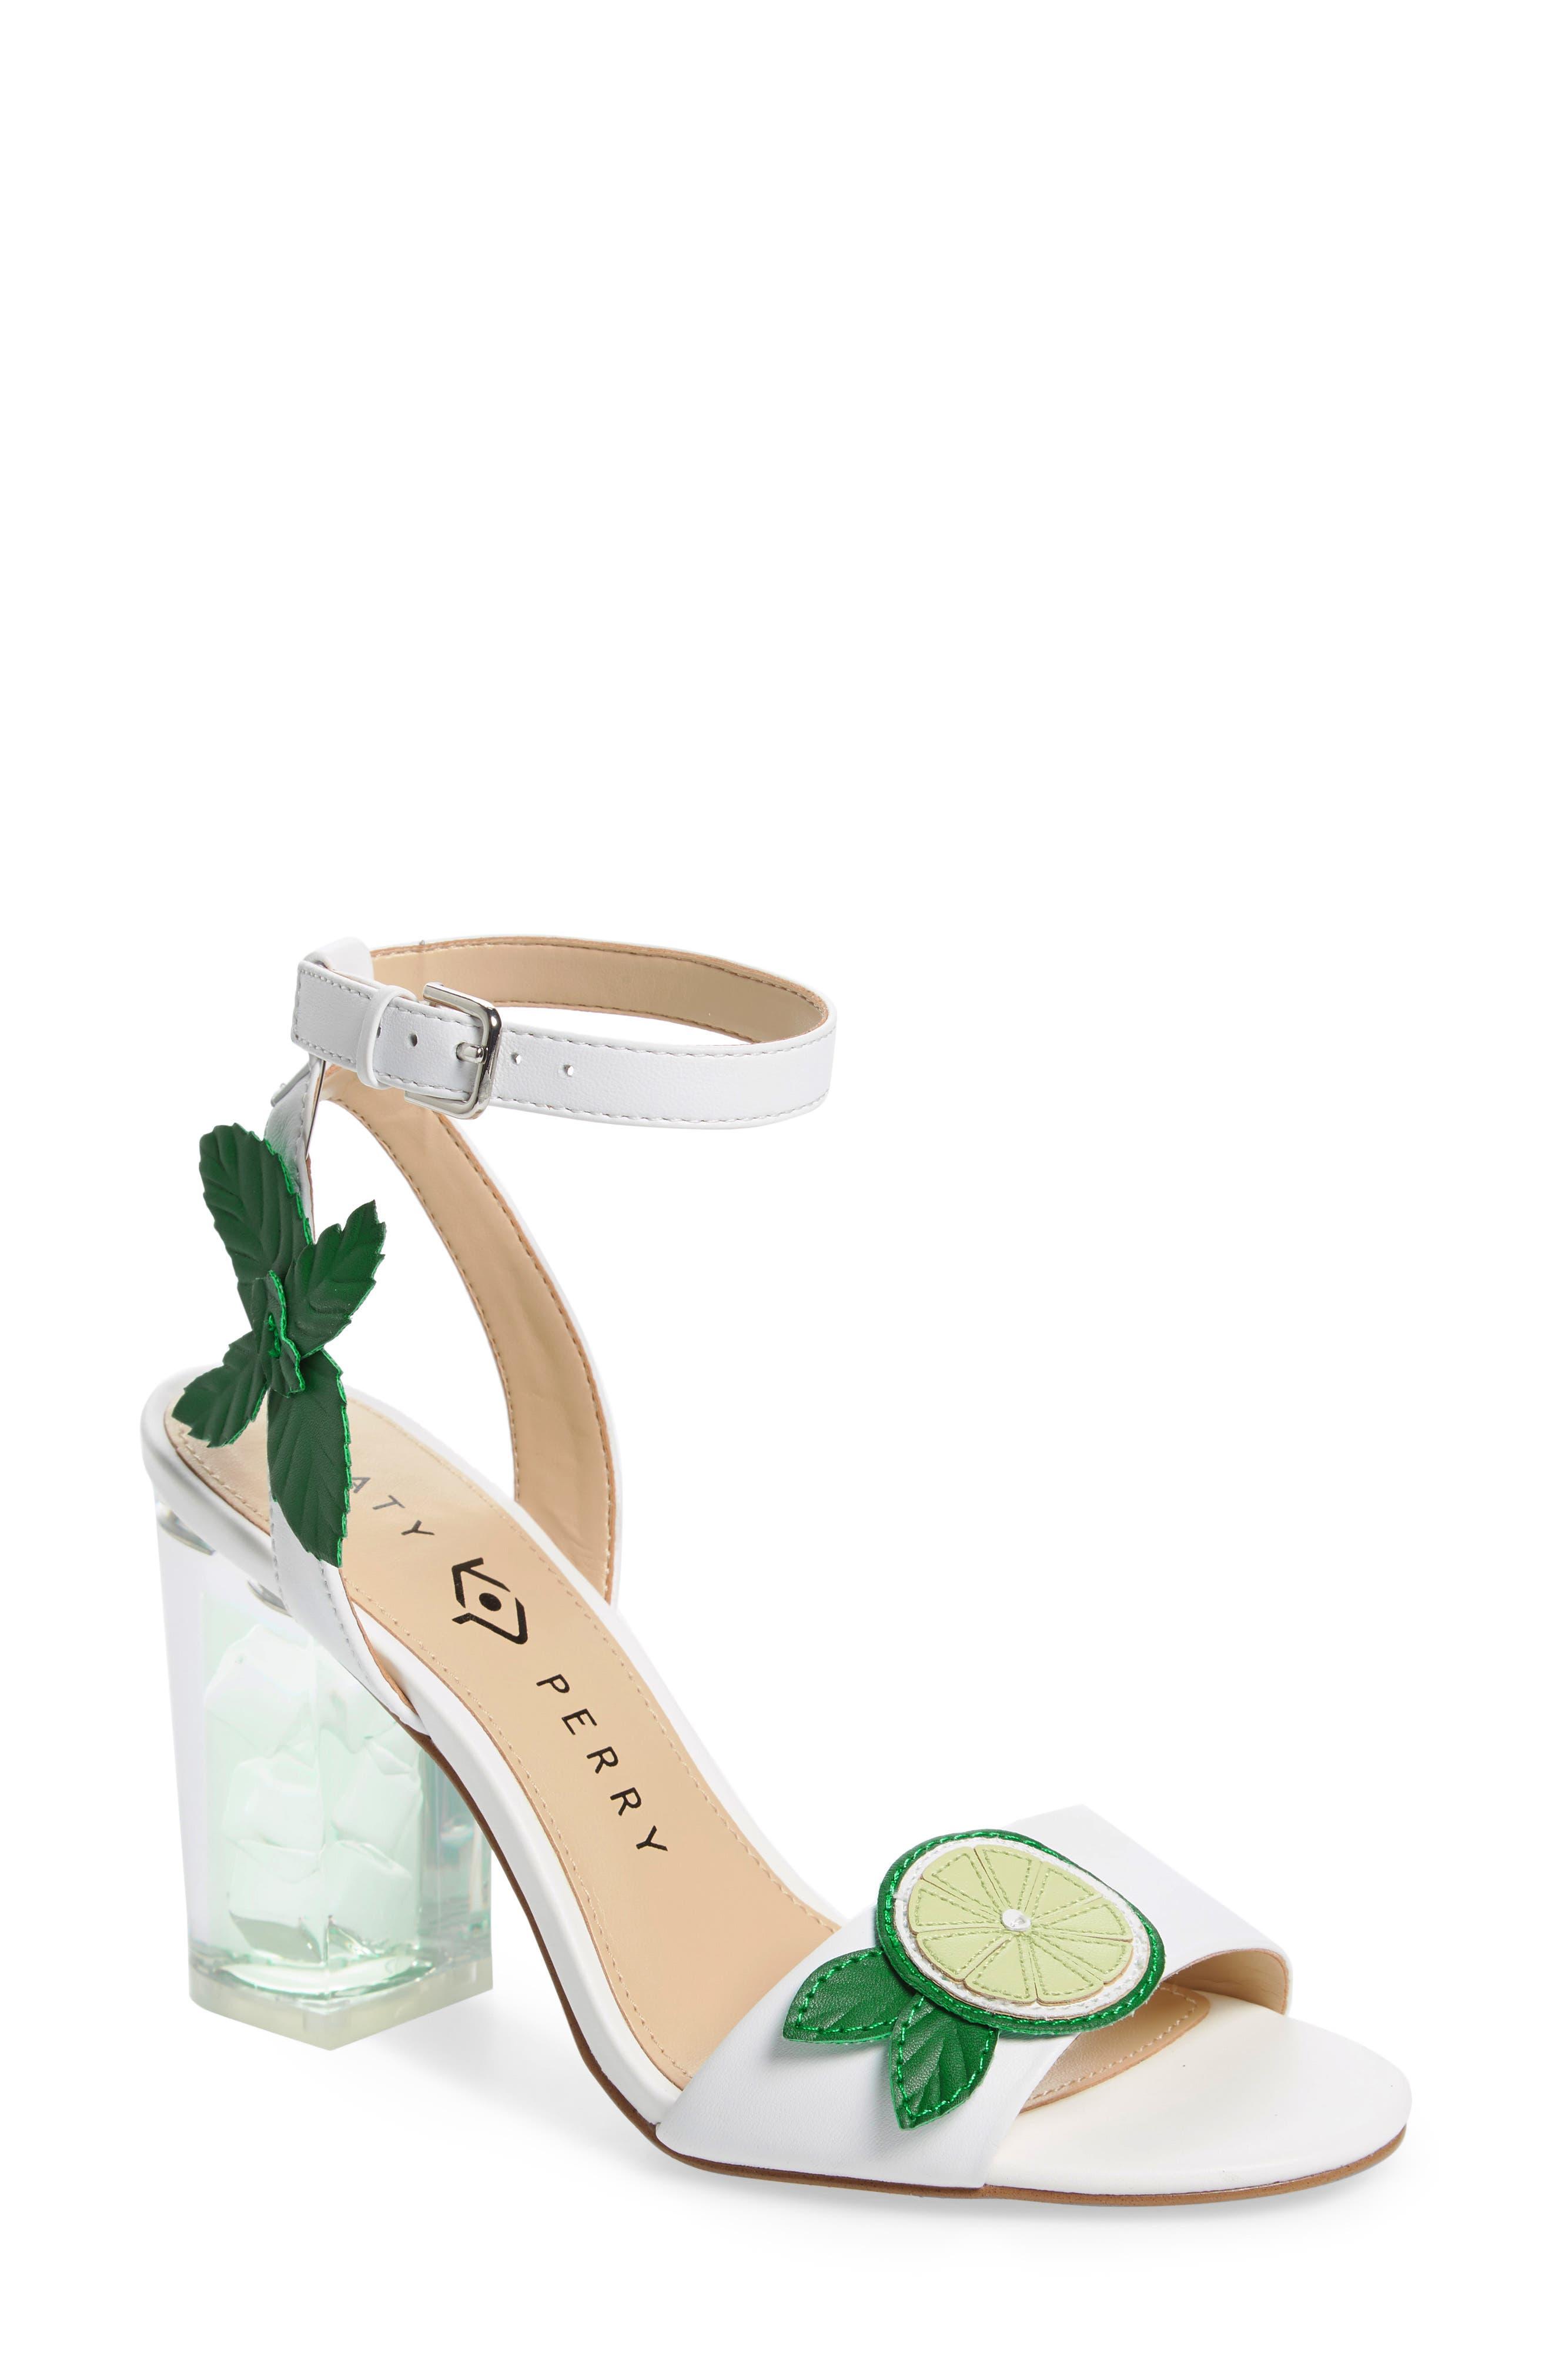 Rita Mohito Sandal,                         Main,                         color, White/ Lime